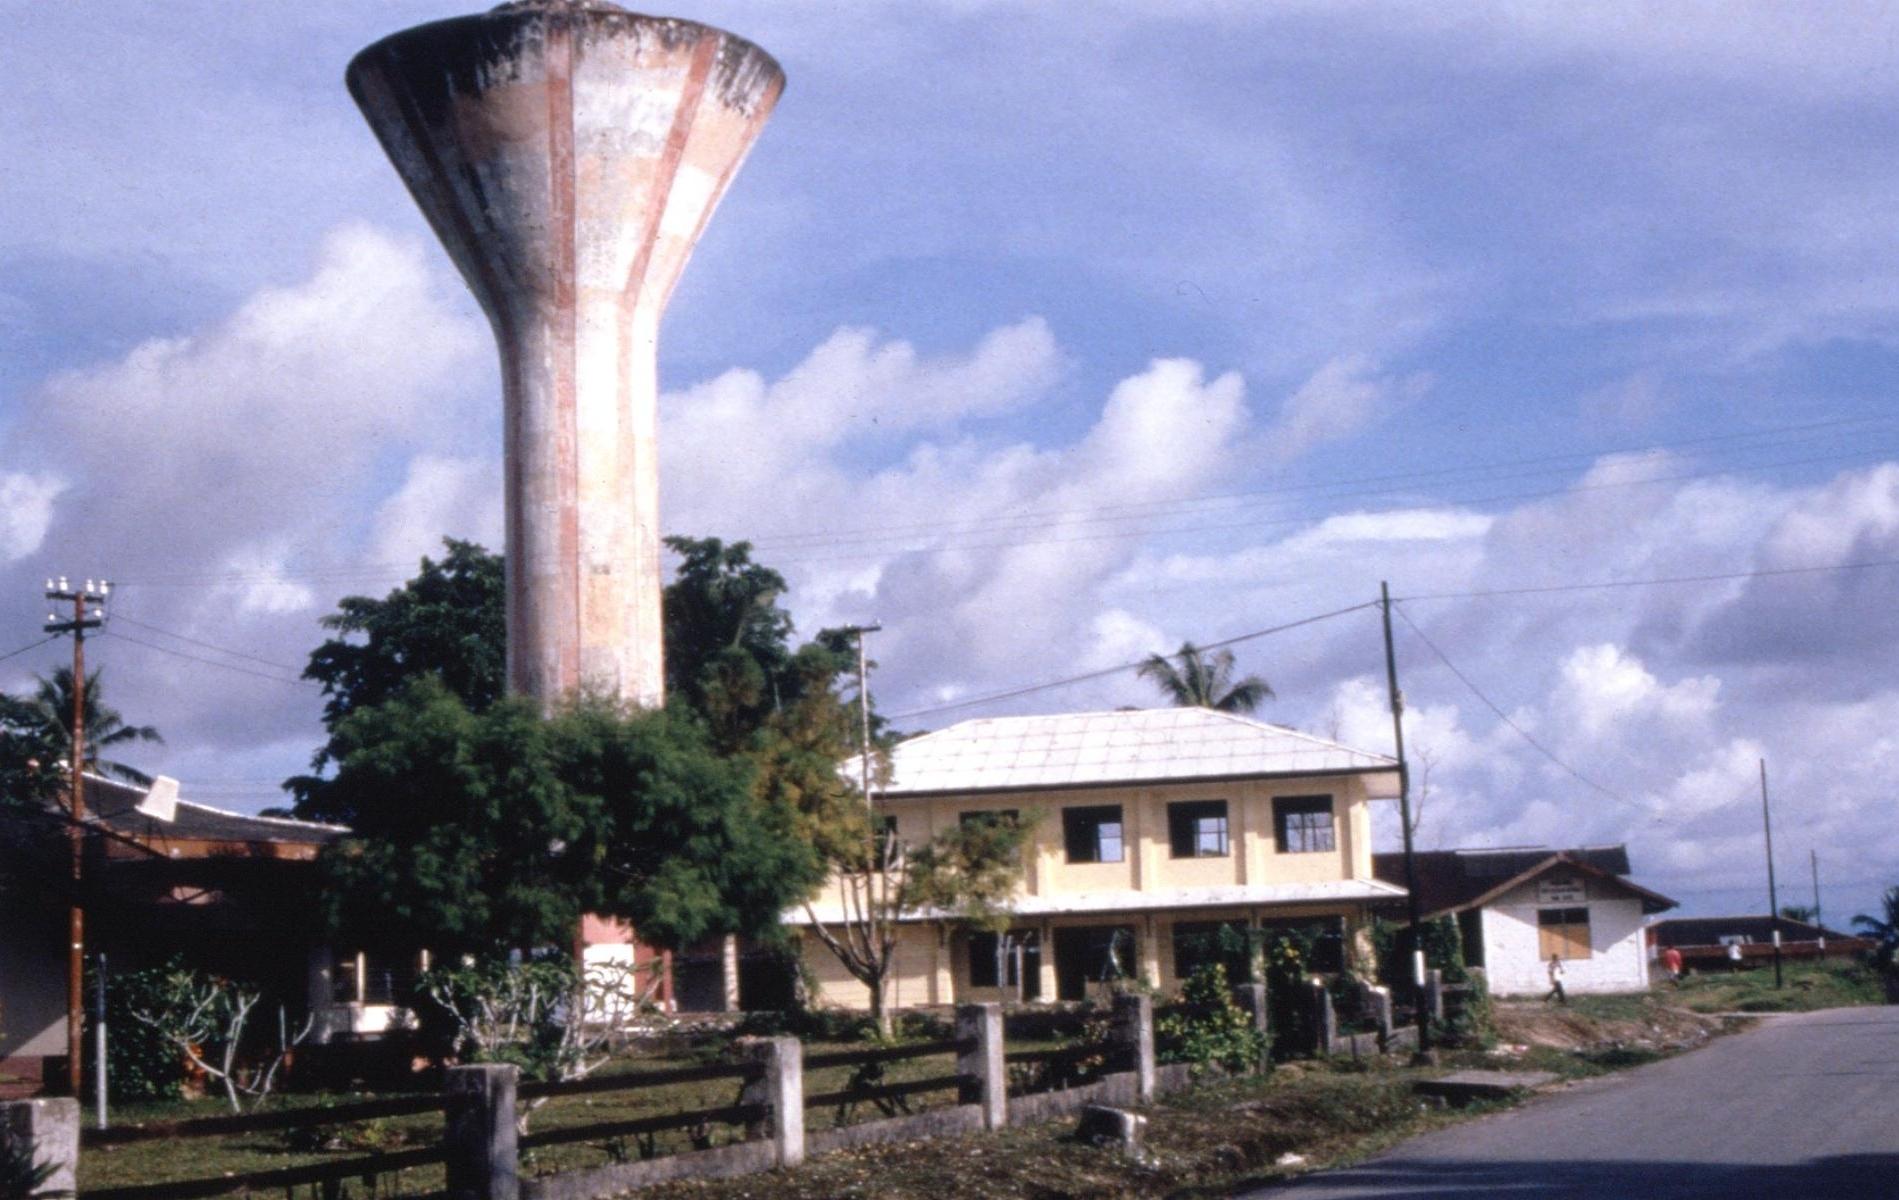 Andrew_Kilvert_WP_photos_1999-2000_water_tower2